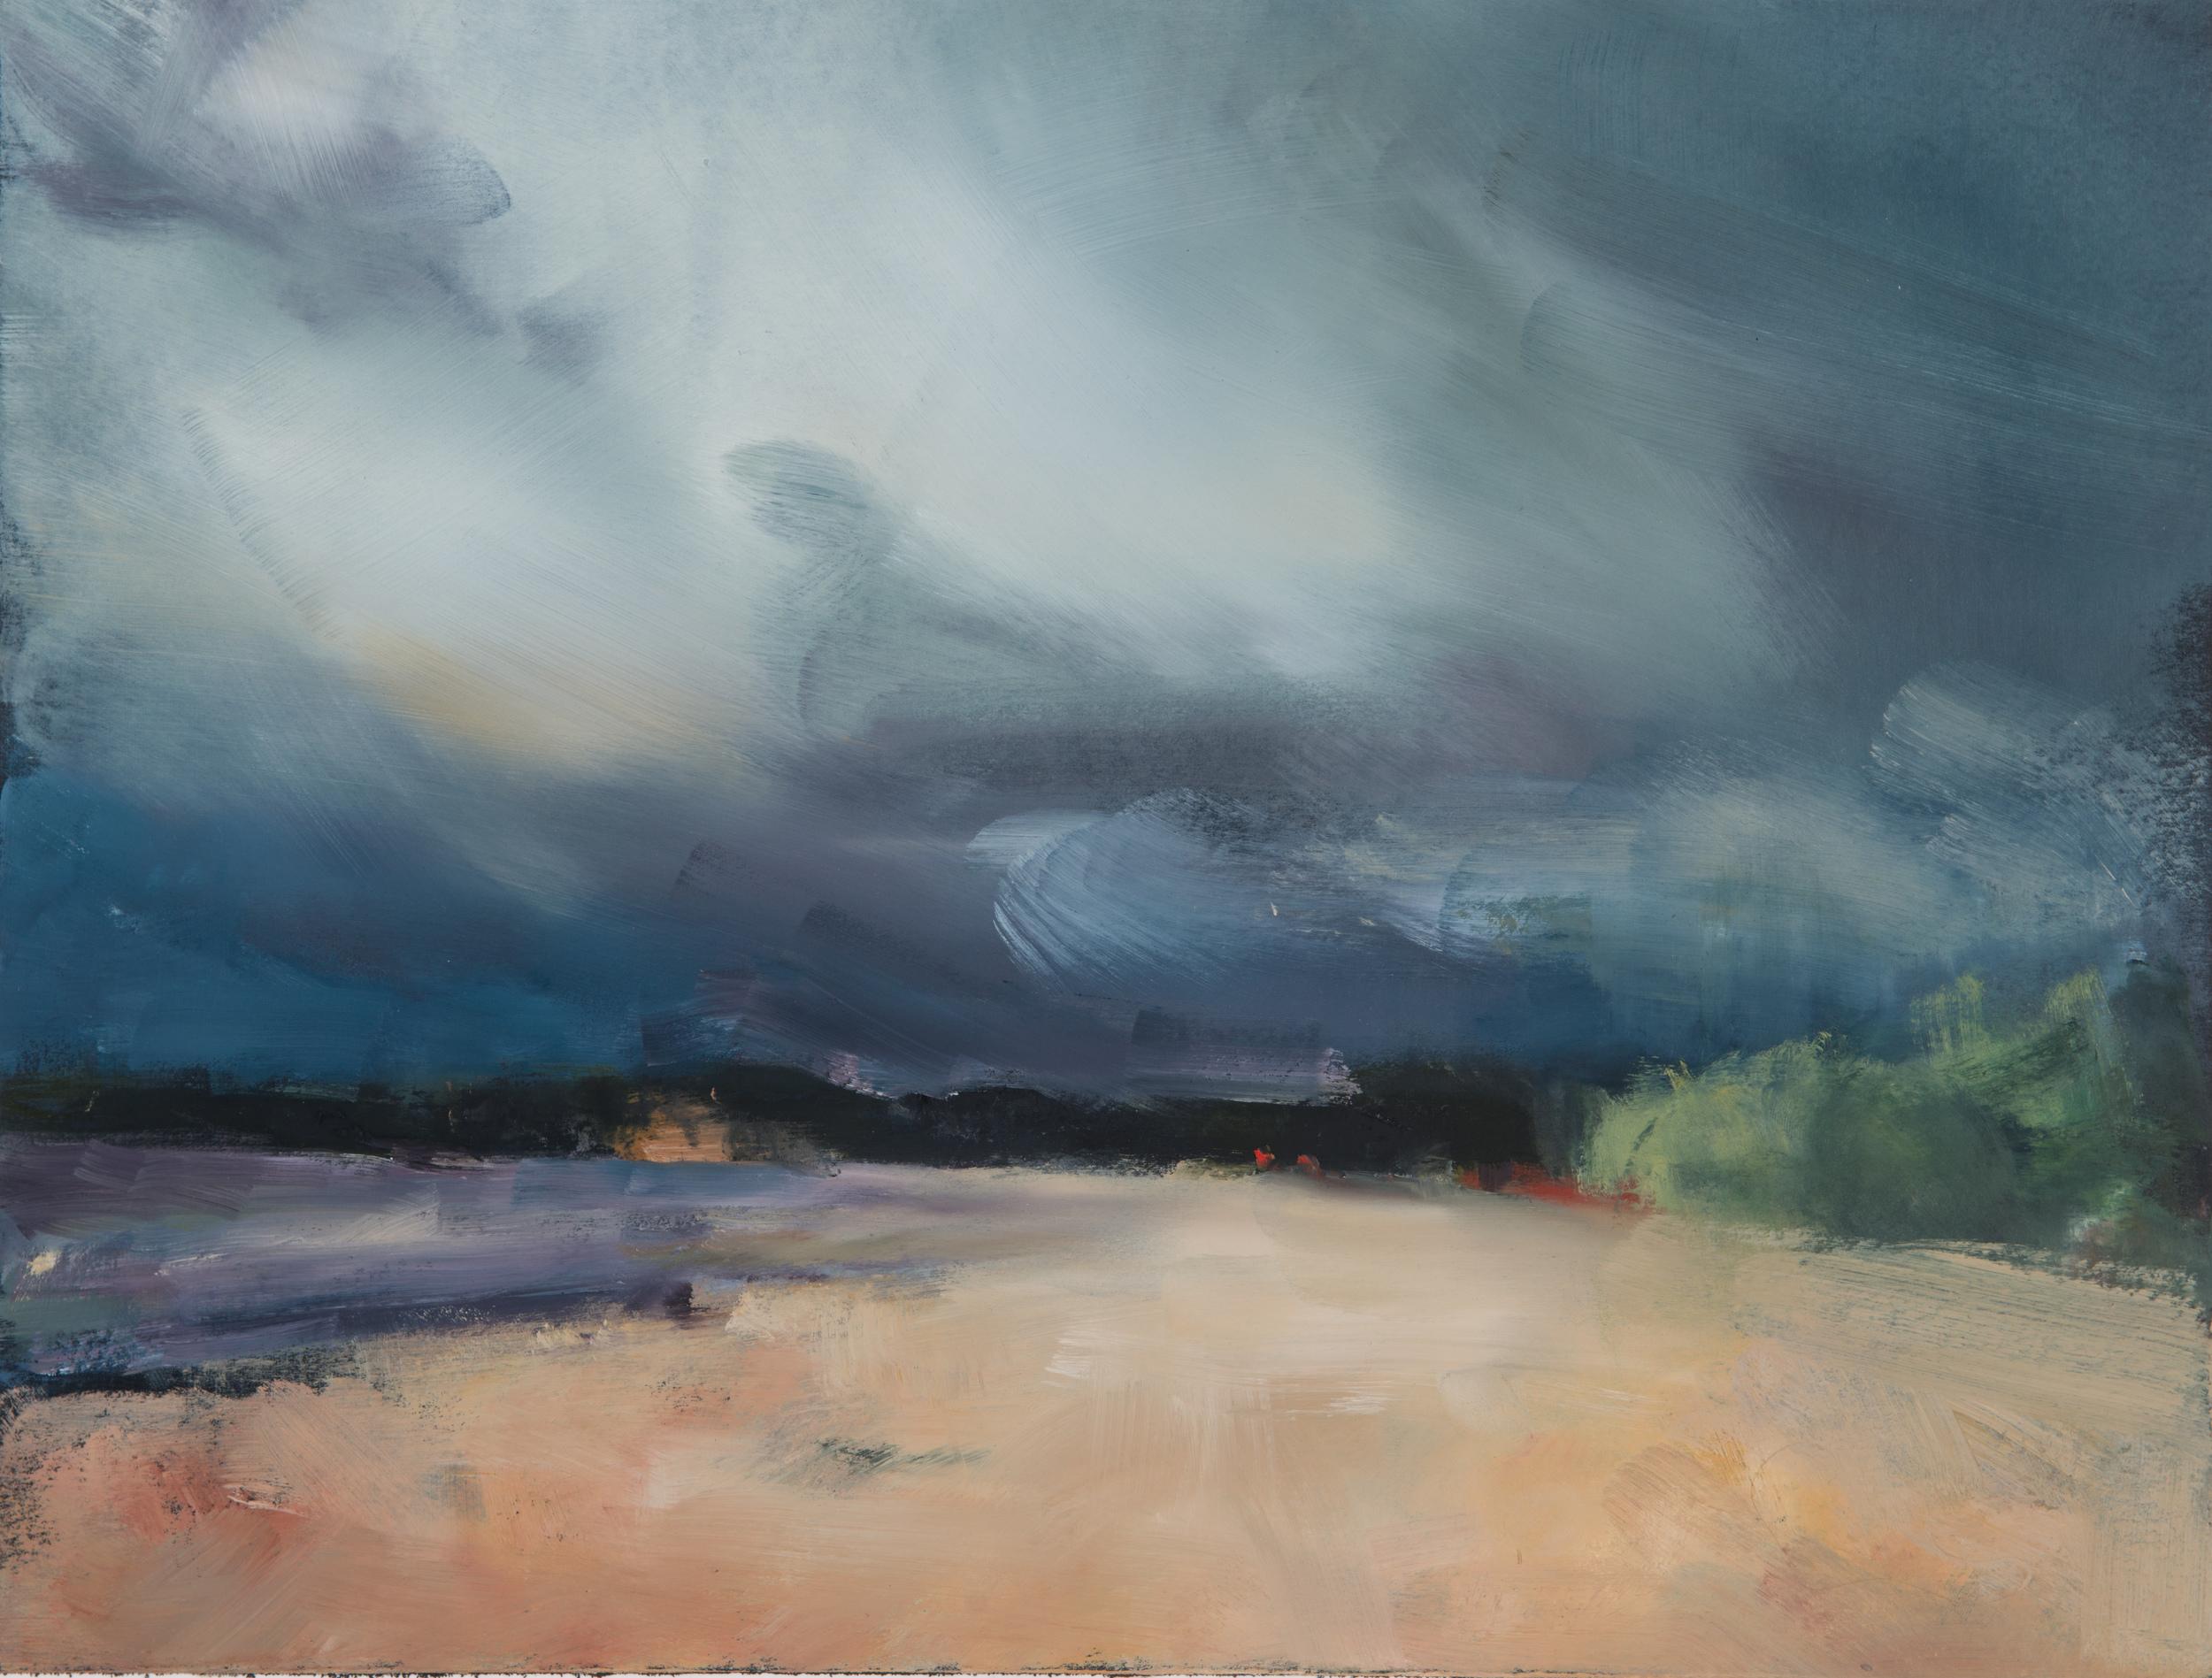 Storm/Lester Beach